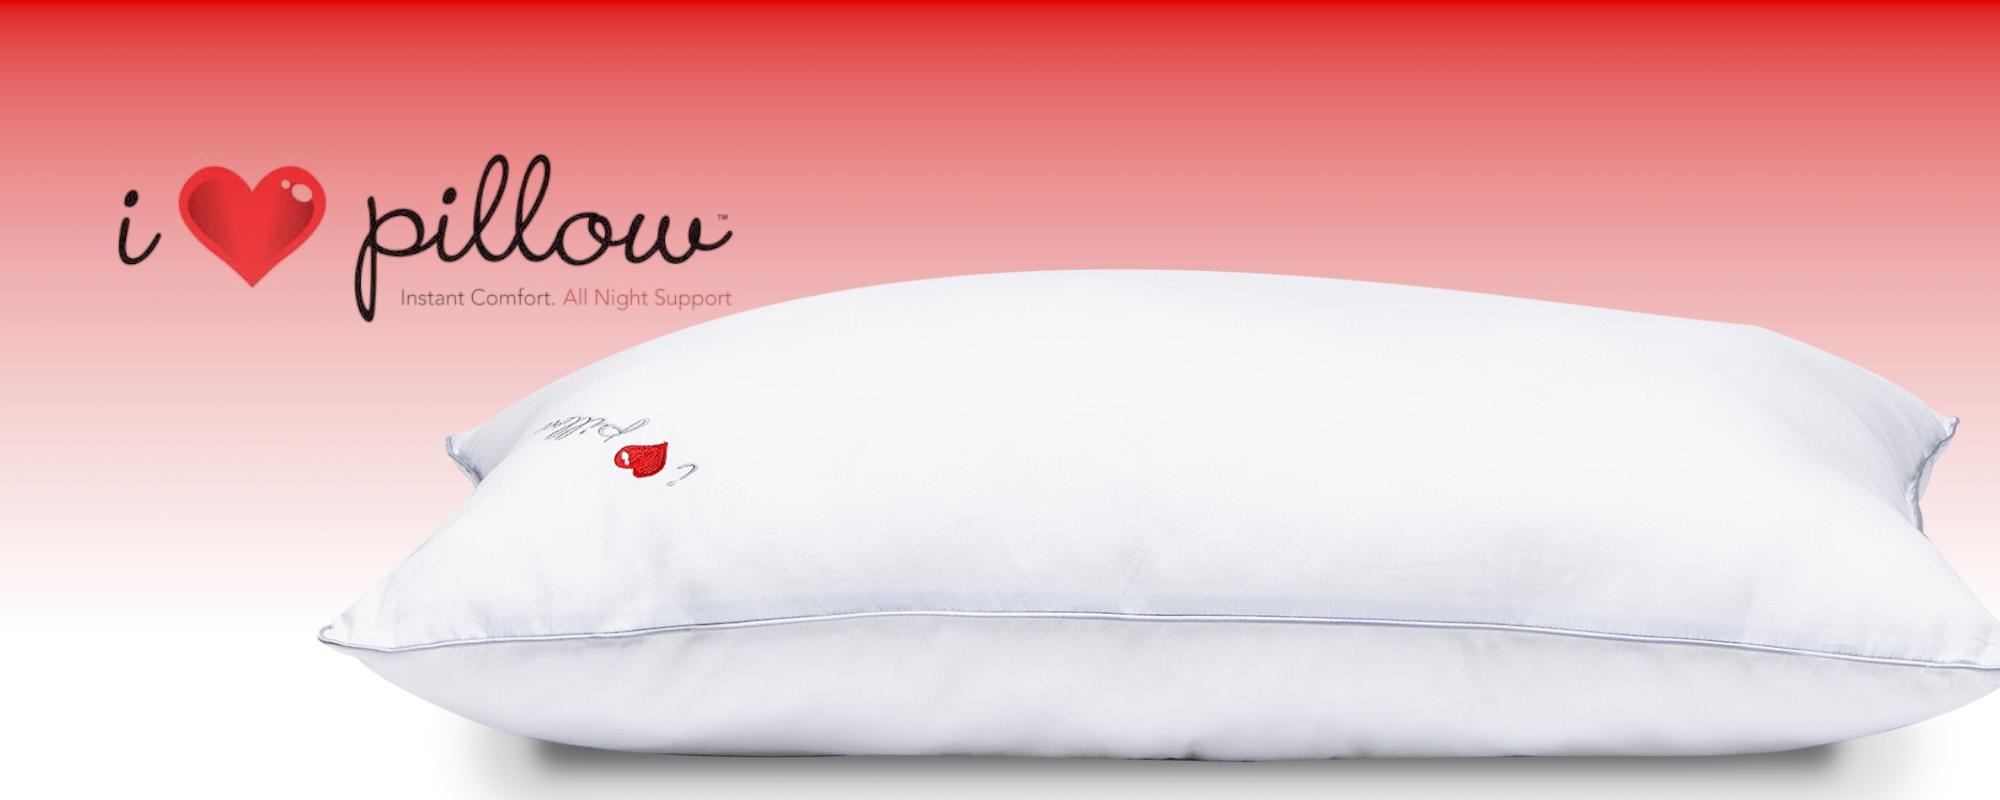 i love pillow cumulus pillow gel coated fiber review